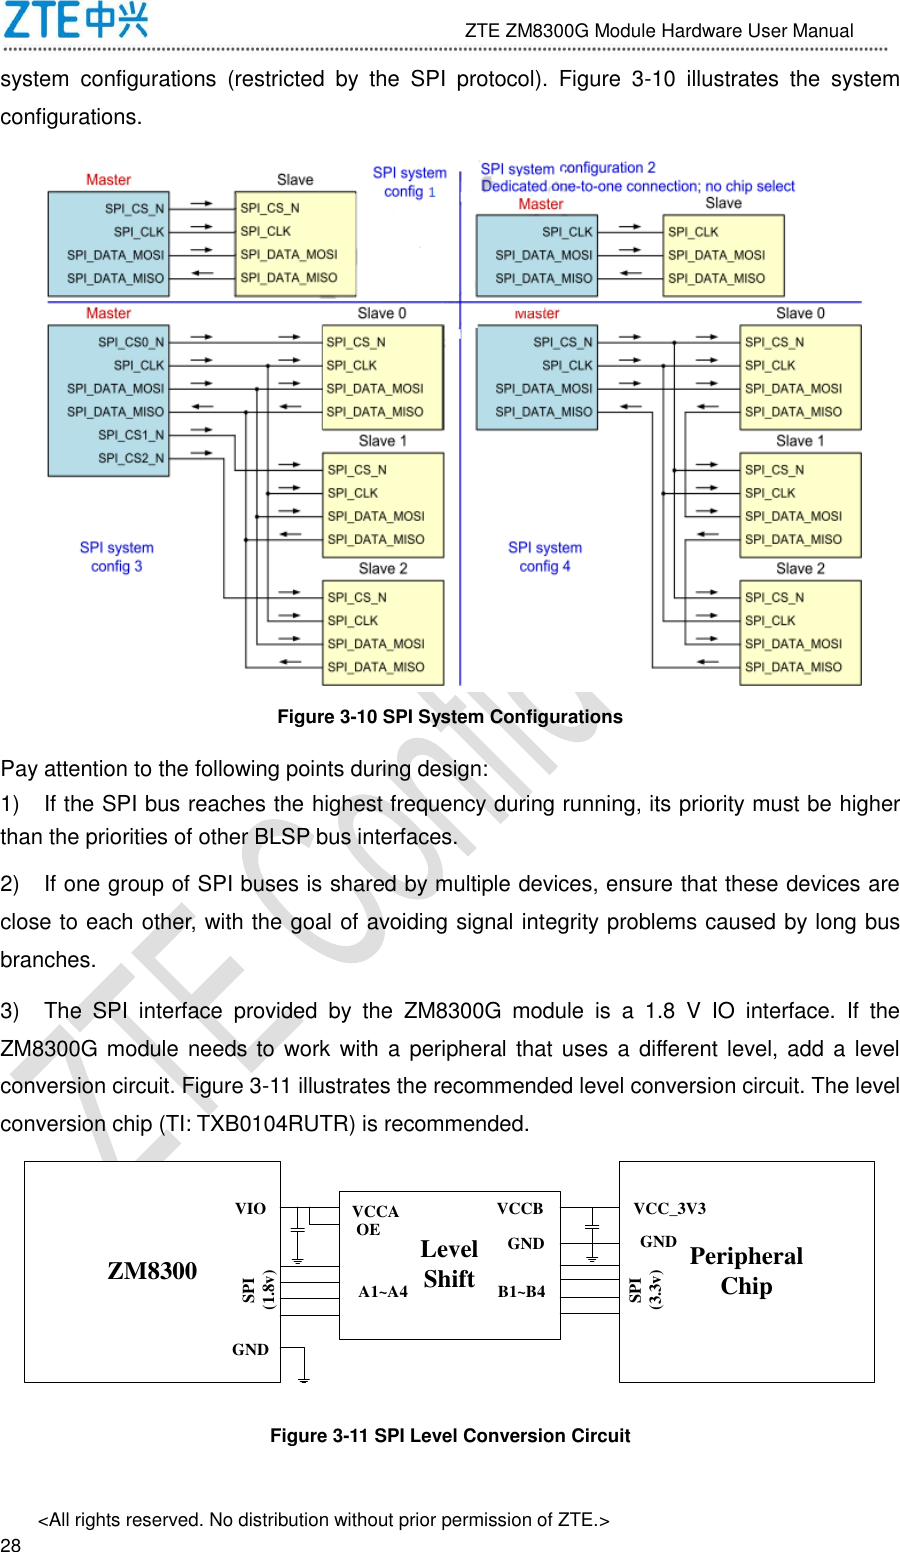 ZTE ZM8300G NB-IoT/eMTC Module User Manual